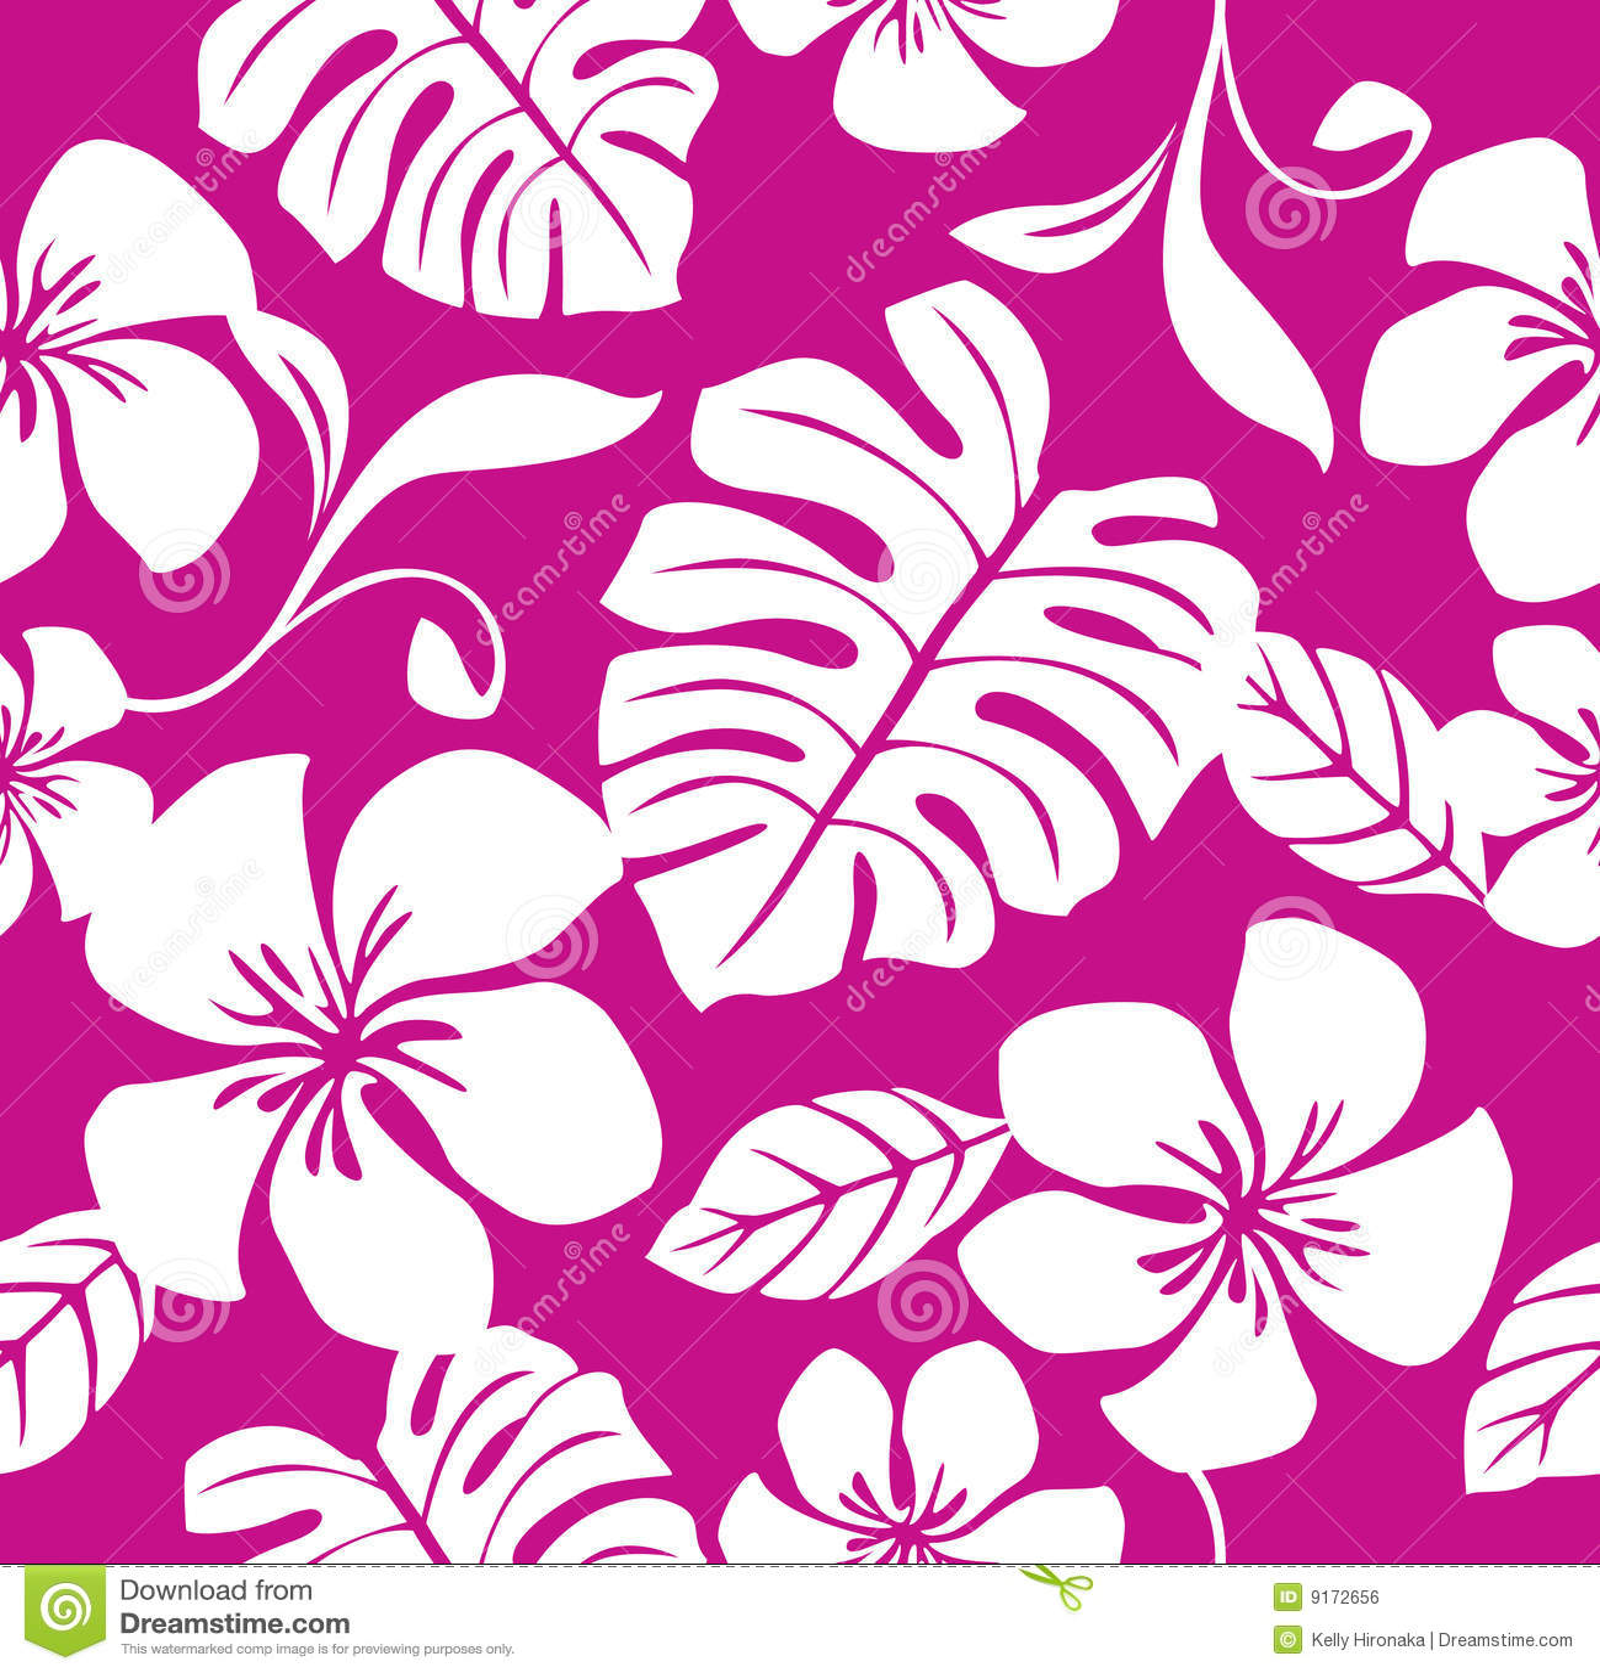 Hawaiian Car Seat Covers >> Seamless Tropical Pink Bikini Pattern Royalty Free Stock ...